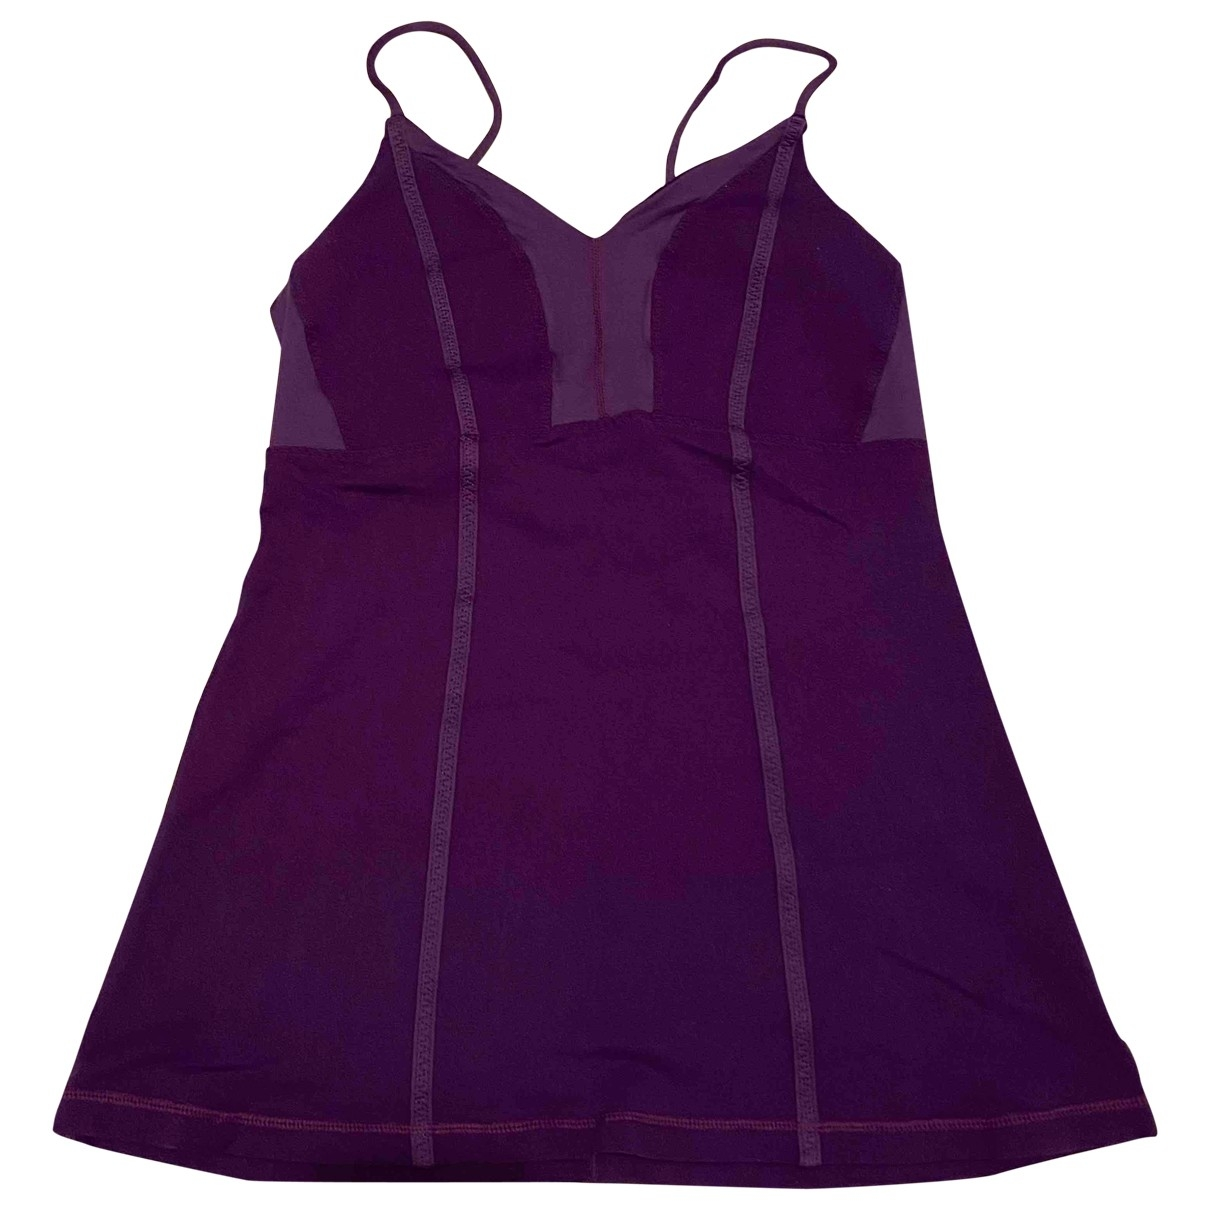 Lululemon - Top   pour femme - violet